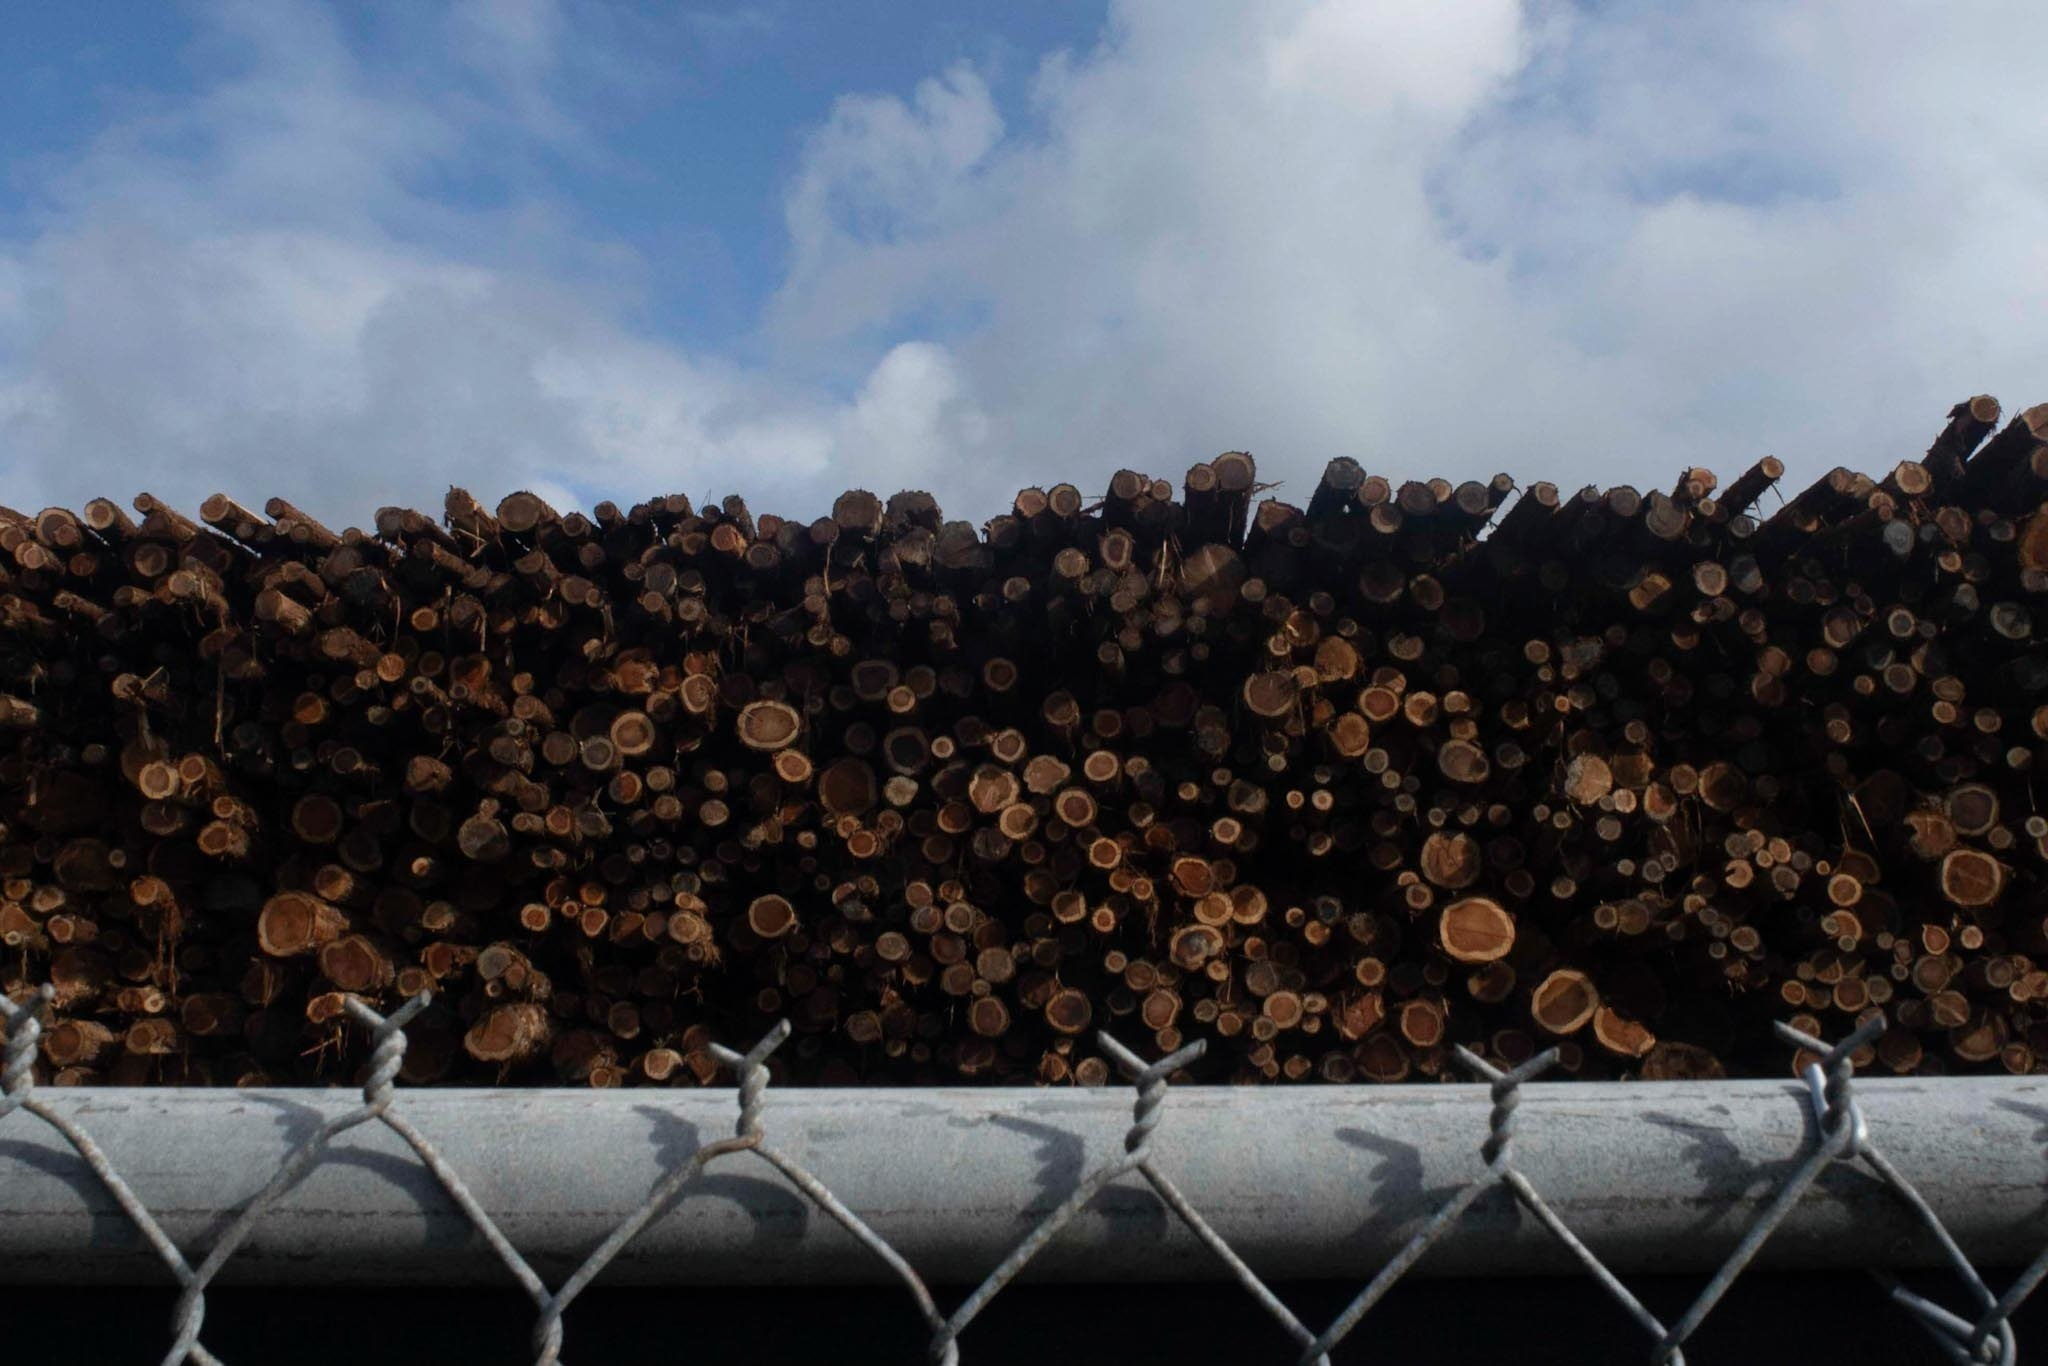 A huge pile of logs